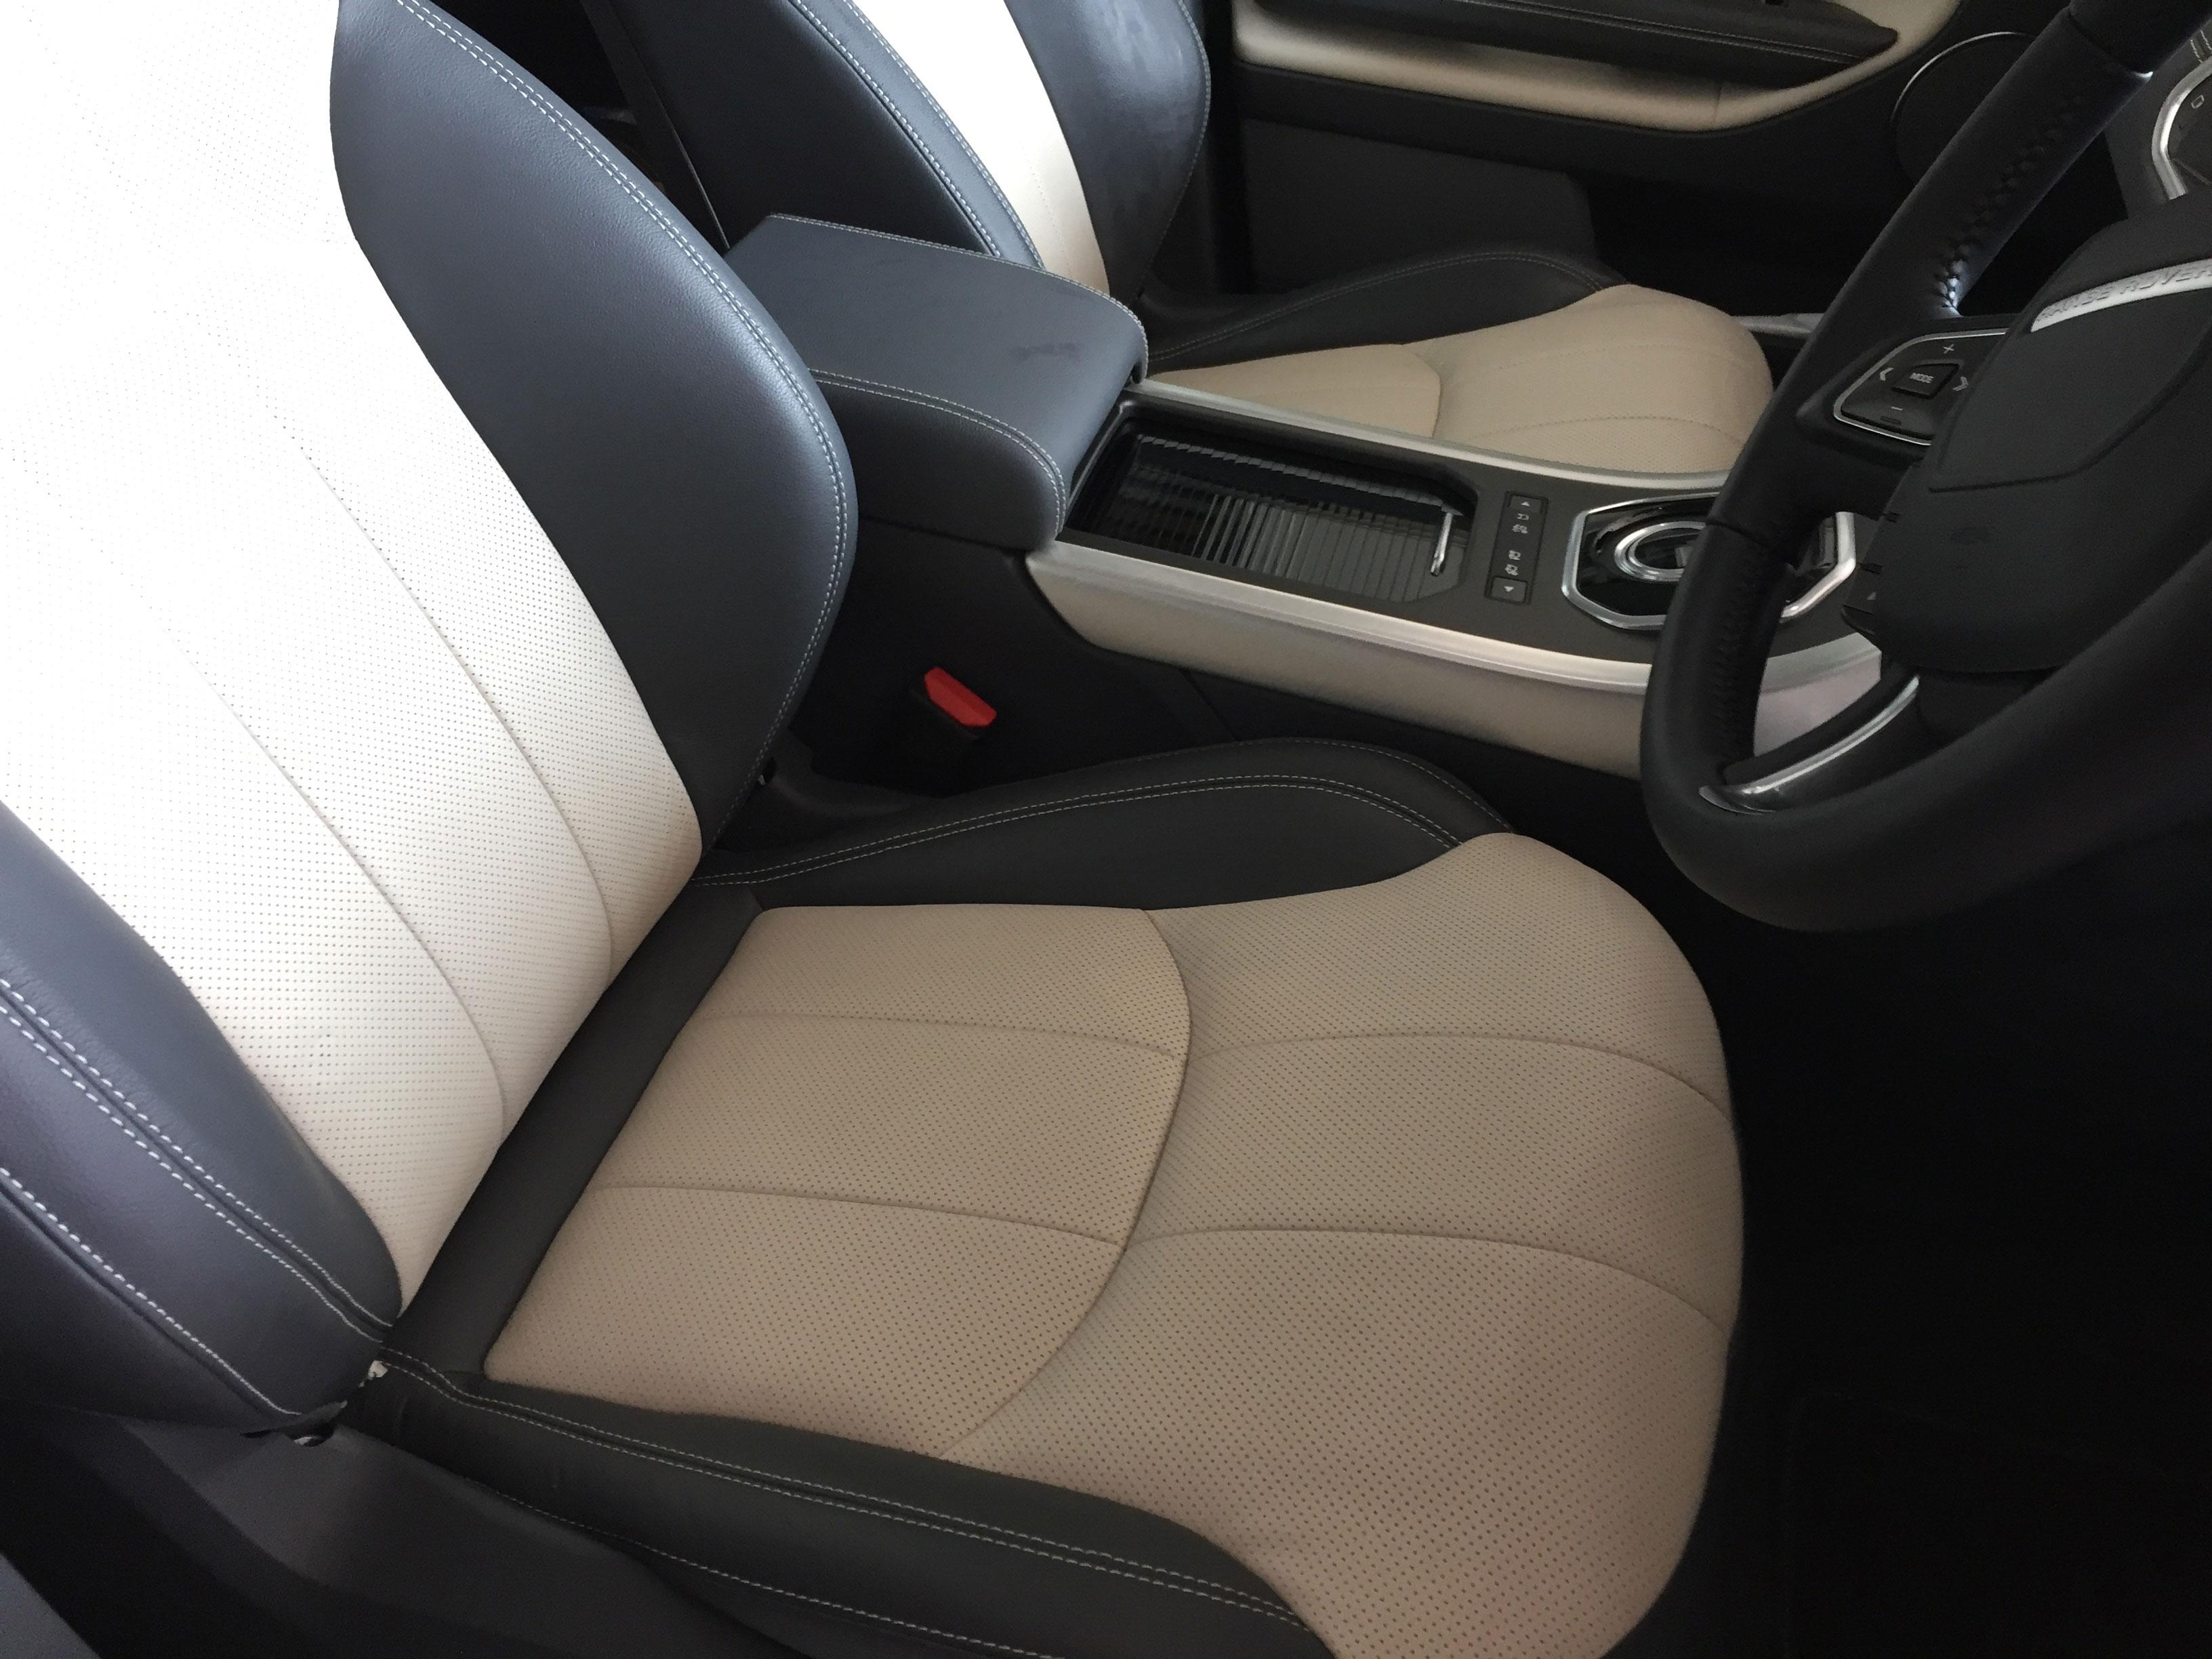 6 month old-Range Rover Evoque leather damage after